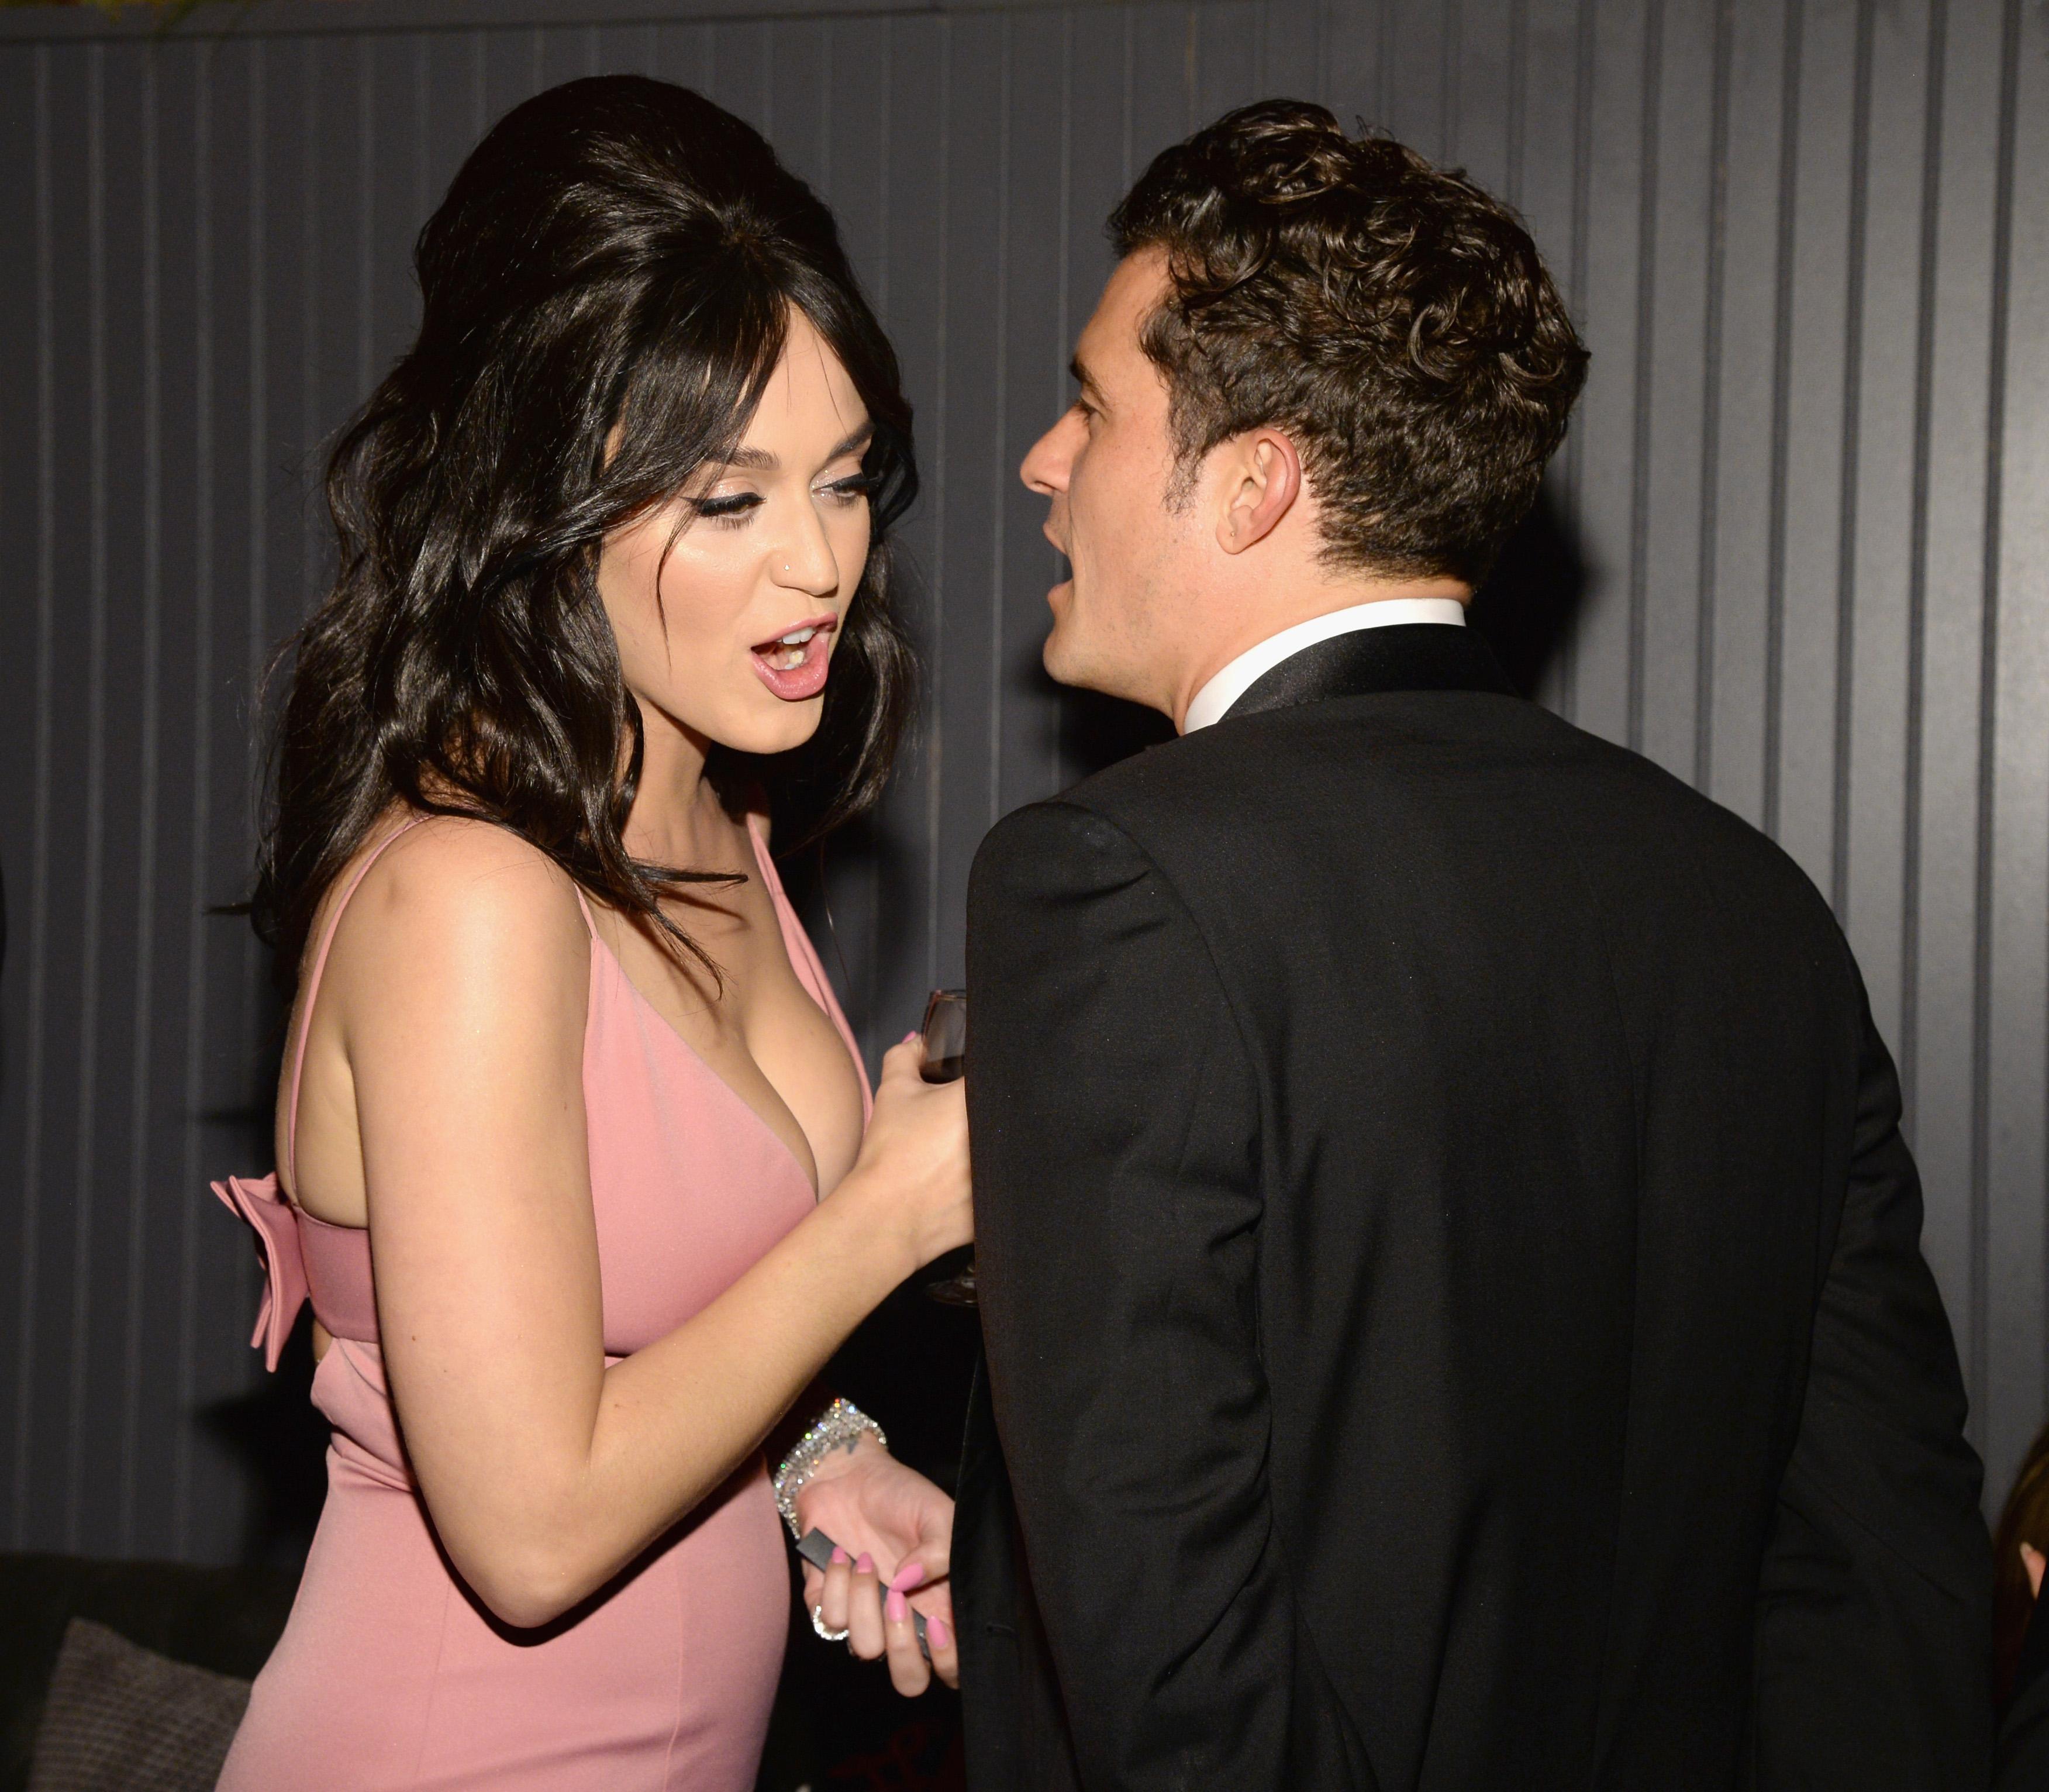 Girlfriend orlando list bloom Katy Perry